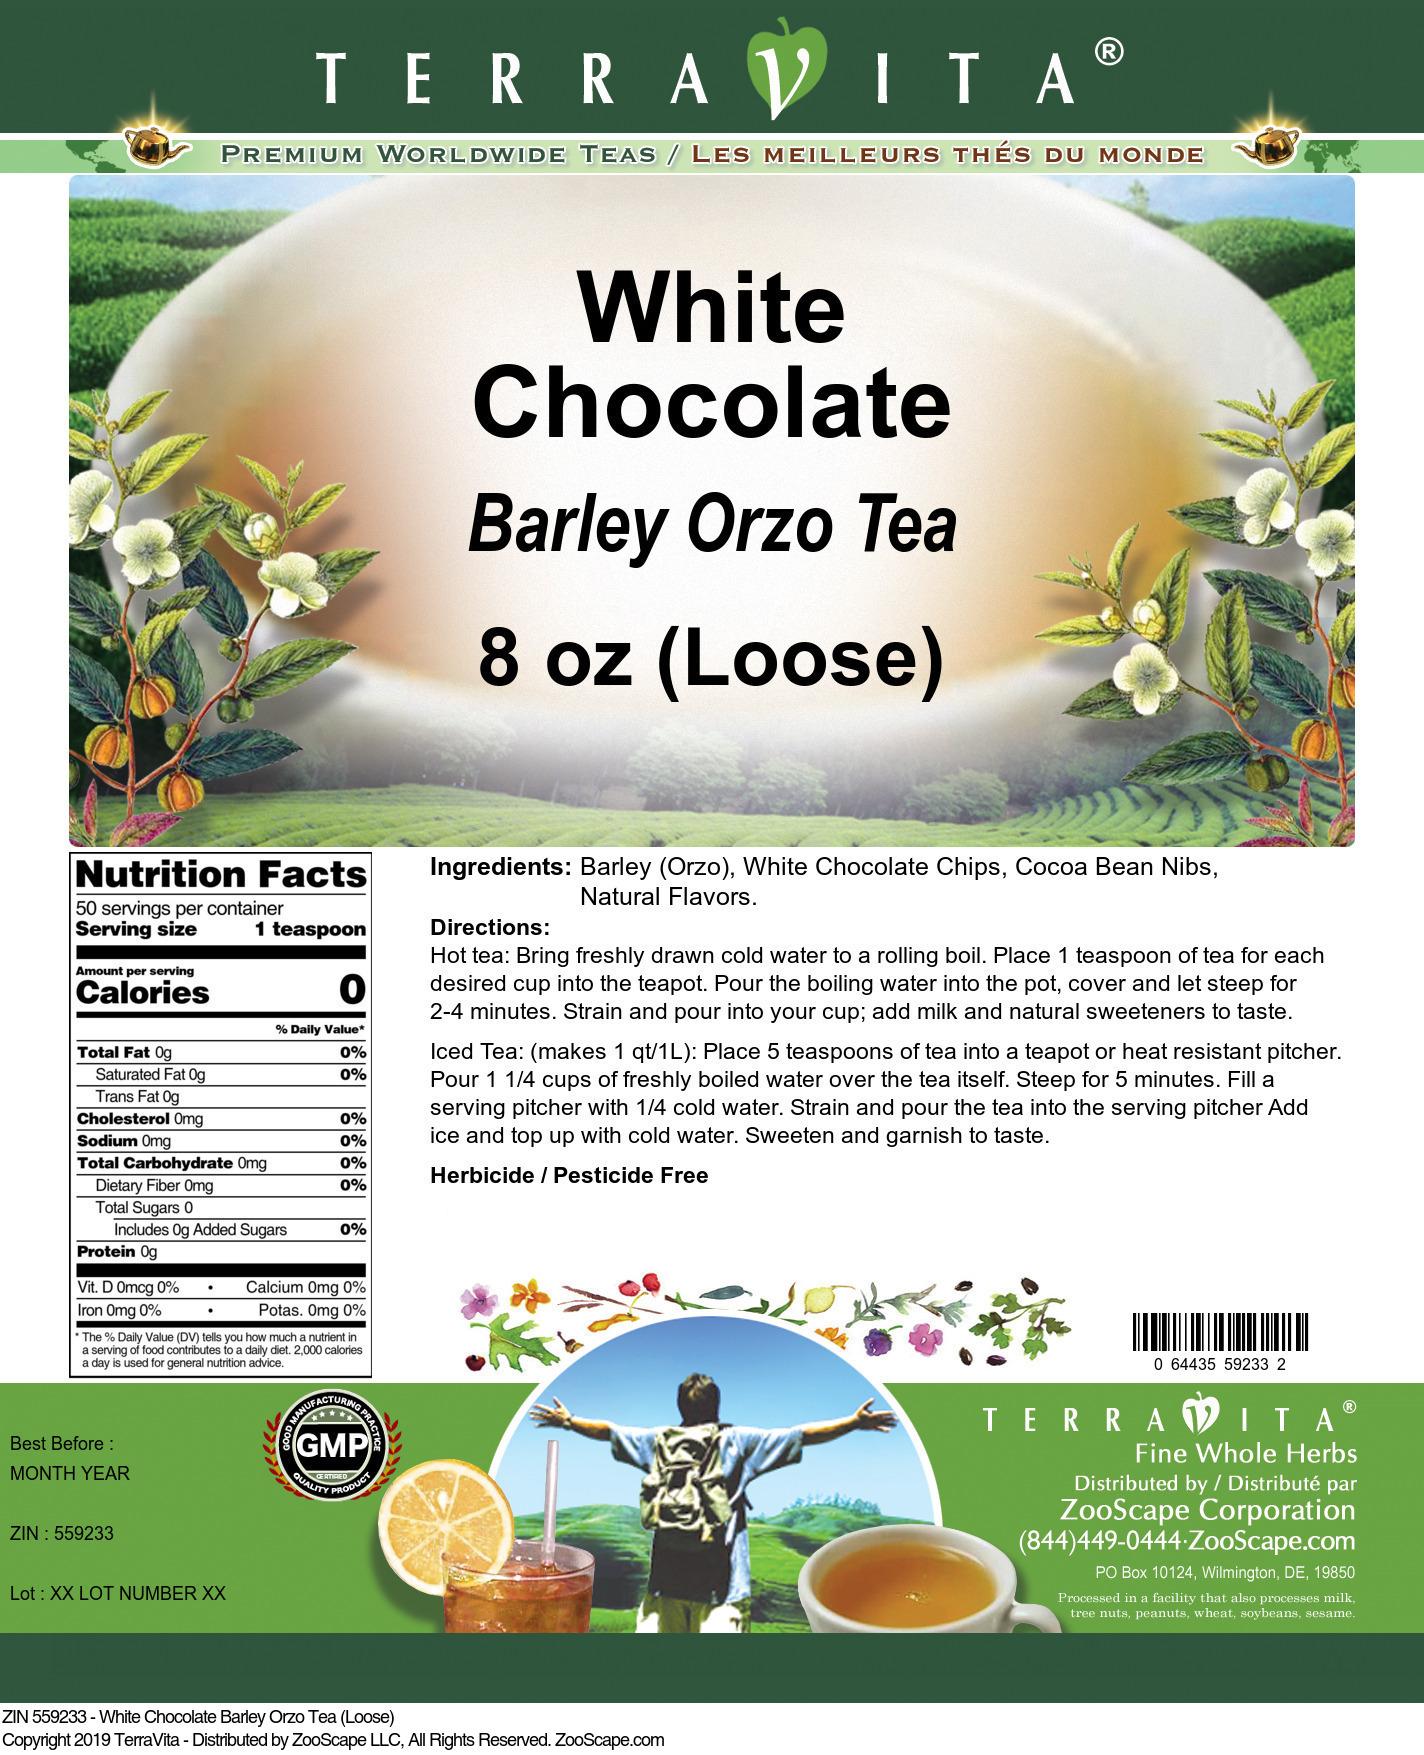 White Chocolate Barley Orzo